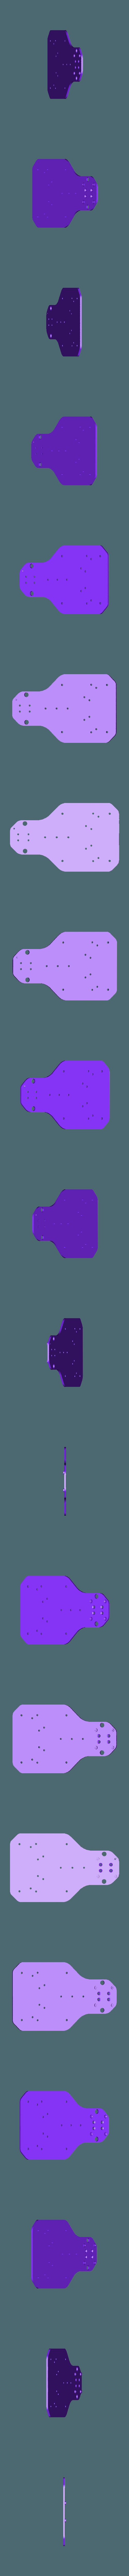 Bottom_Plate.stl Download free STL file Experimental Multirotor • 3D printable model, SeanTheITGuy